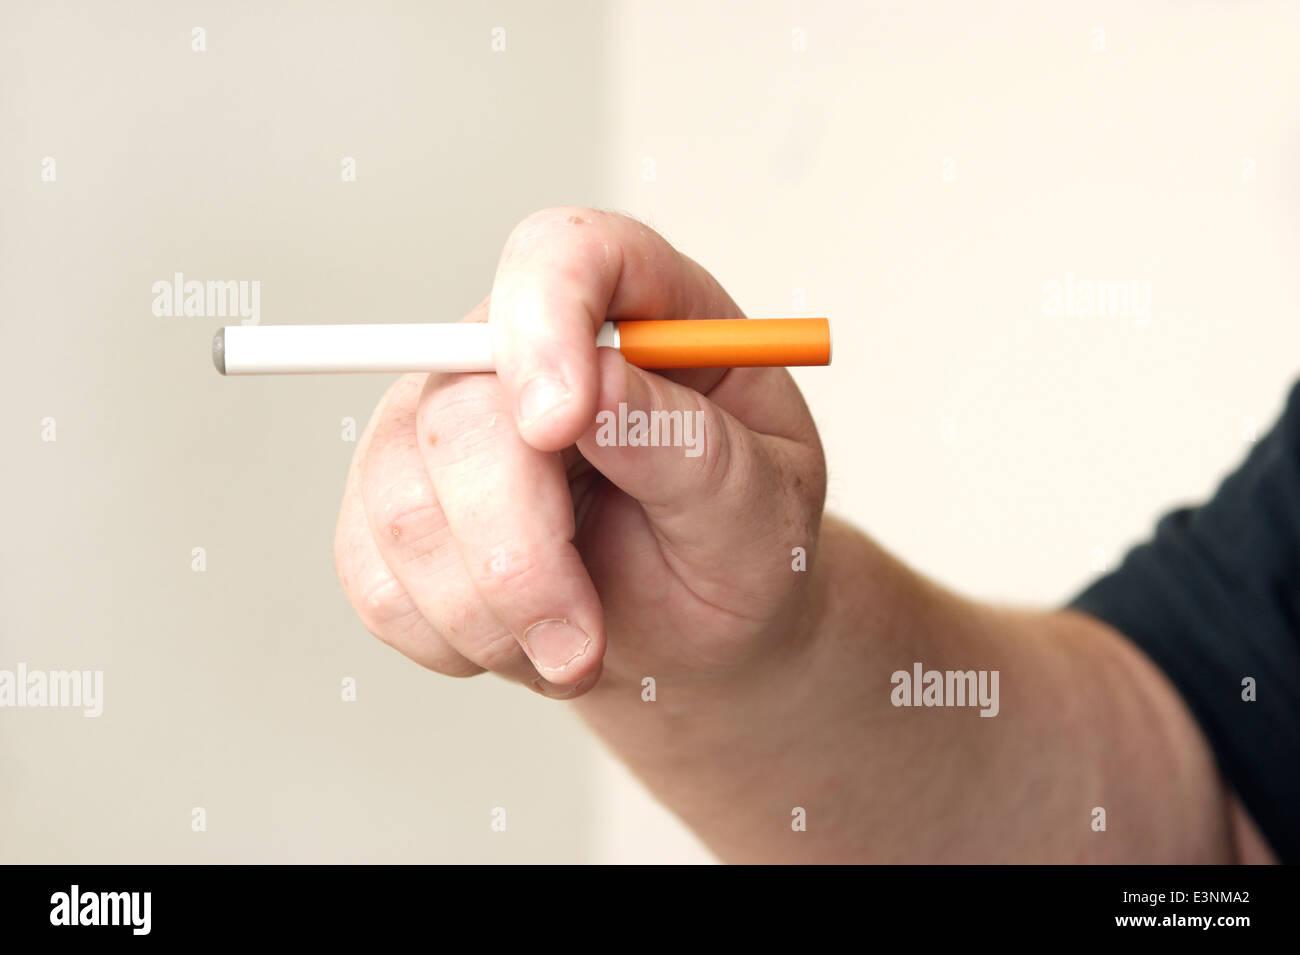 Man holding an electronic disposable E Cigarette (e-cigarette) - Stock Image